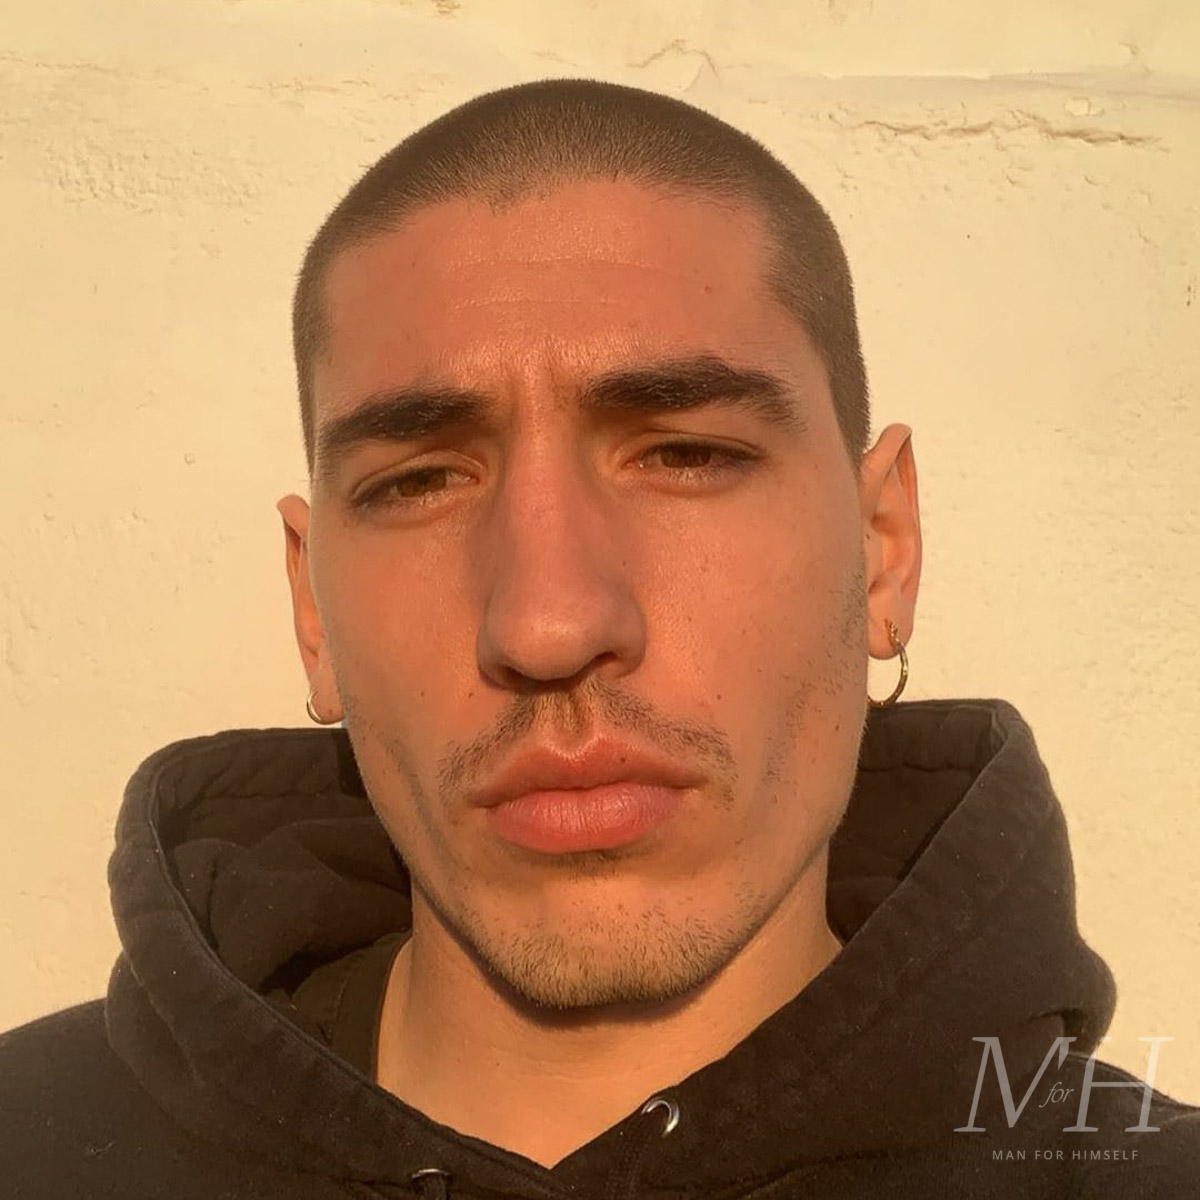 hector-bellerin-hair-shaved-head-lockdown-2020-buzzcut-man-for-himself